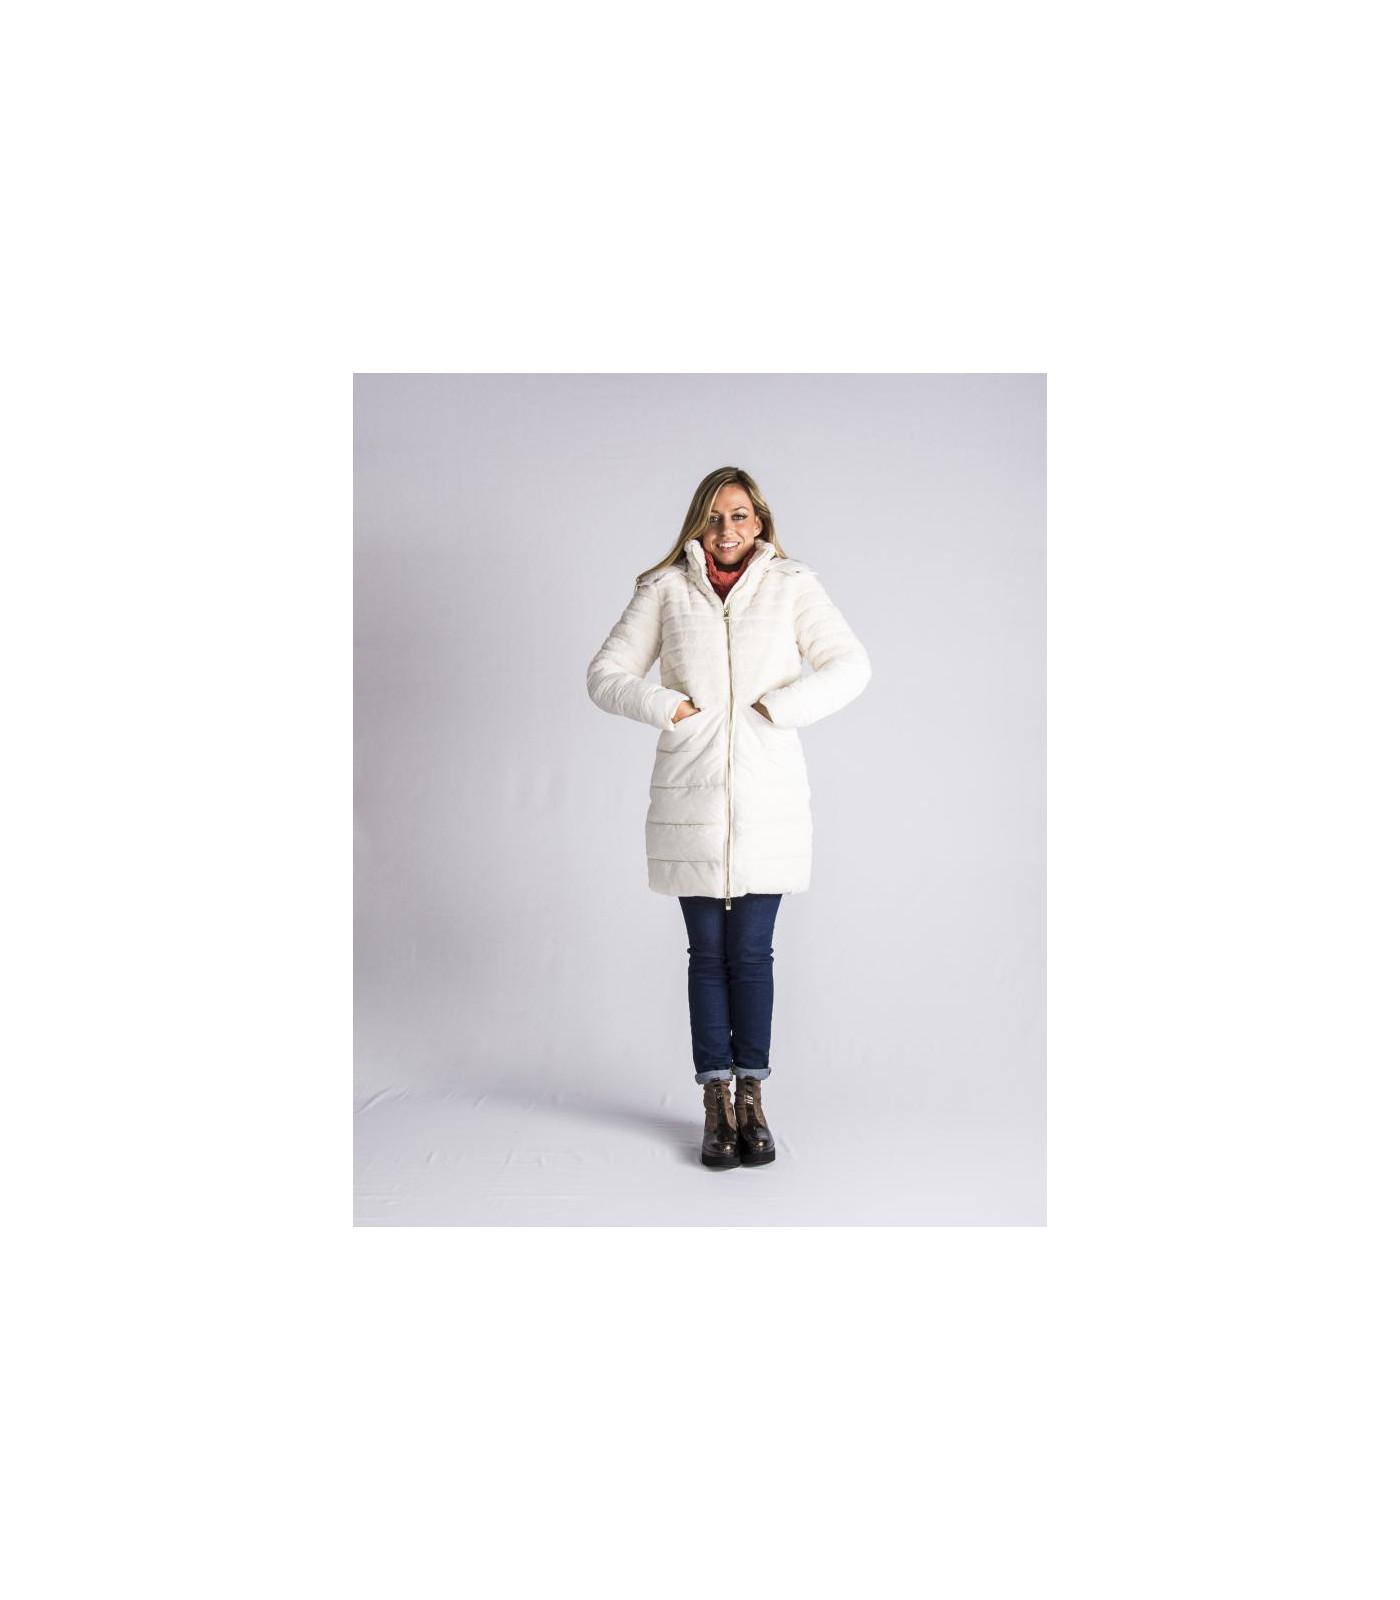 Lola Calzado Y Salsa Moda Plumas Blanco En Abrigo FnRB1x